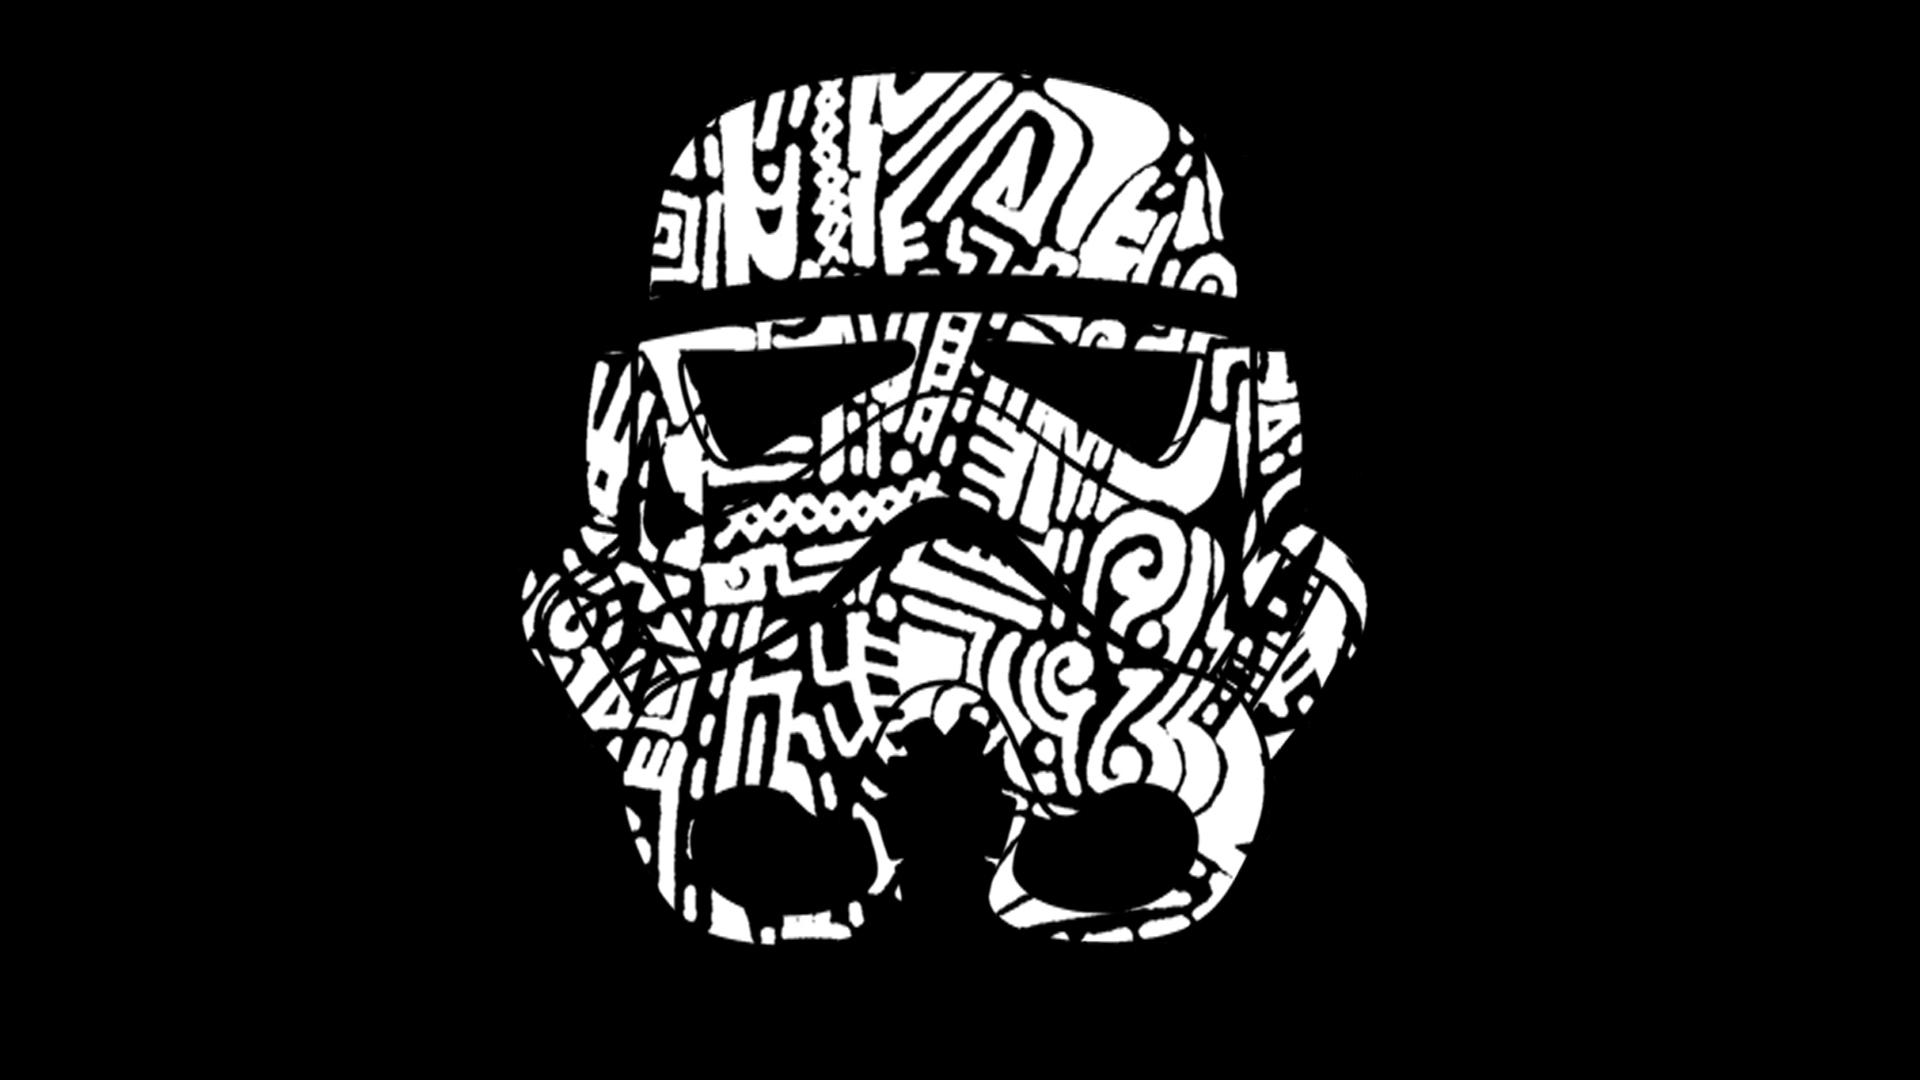 Great Wallpaper Black And White Star Wars - 37cfb3796faefb6b8aeda9346e6db98fd0002fda  Gallery_4675.jpg